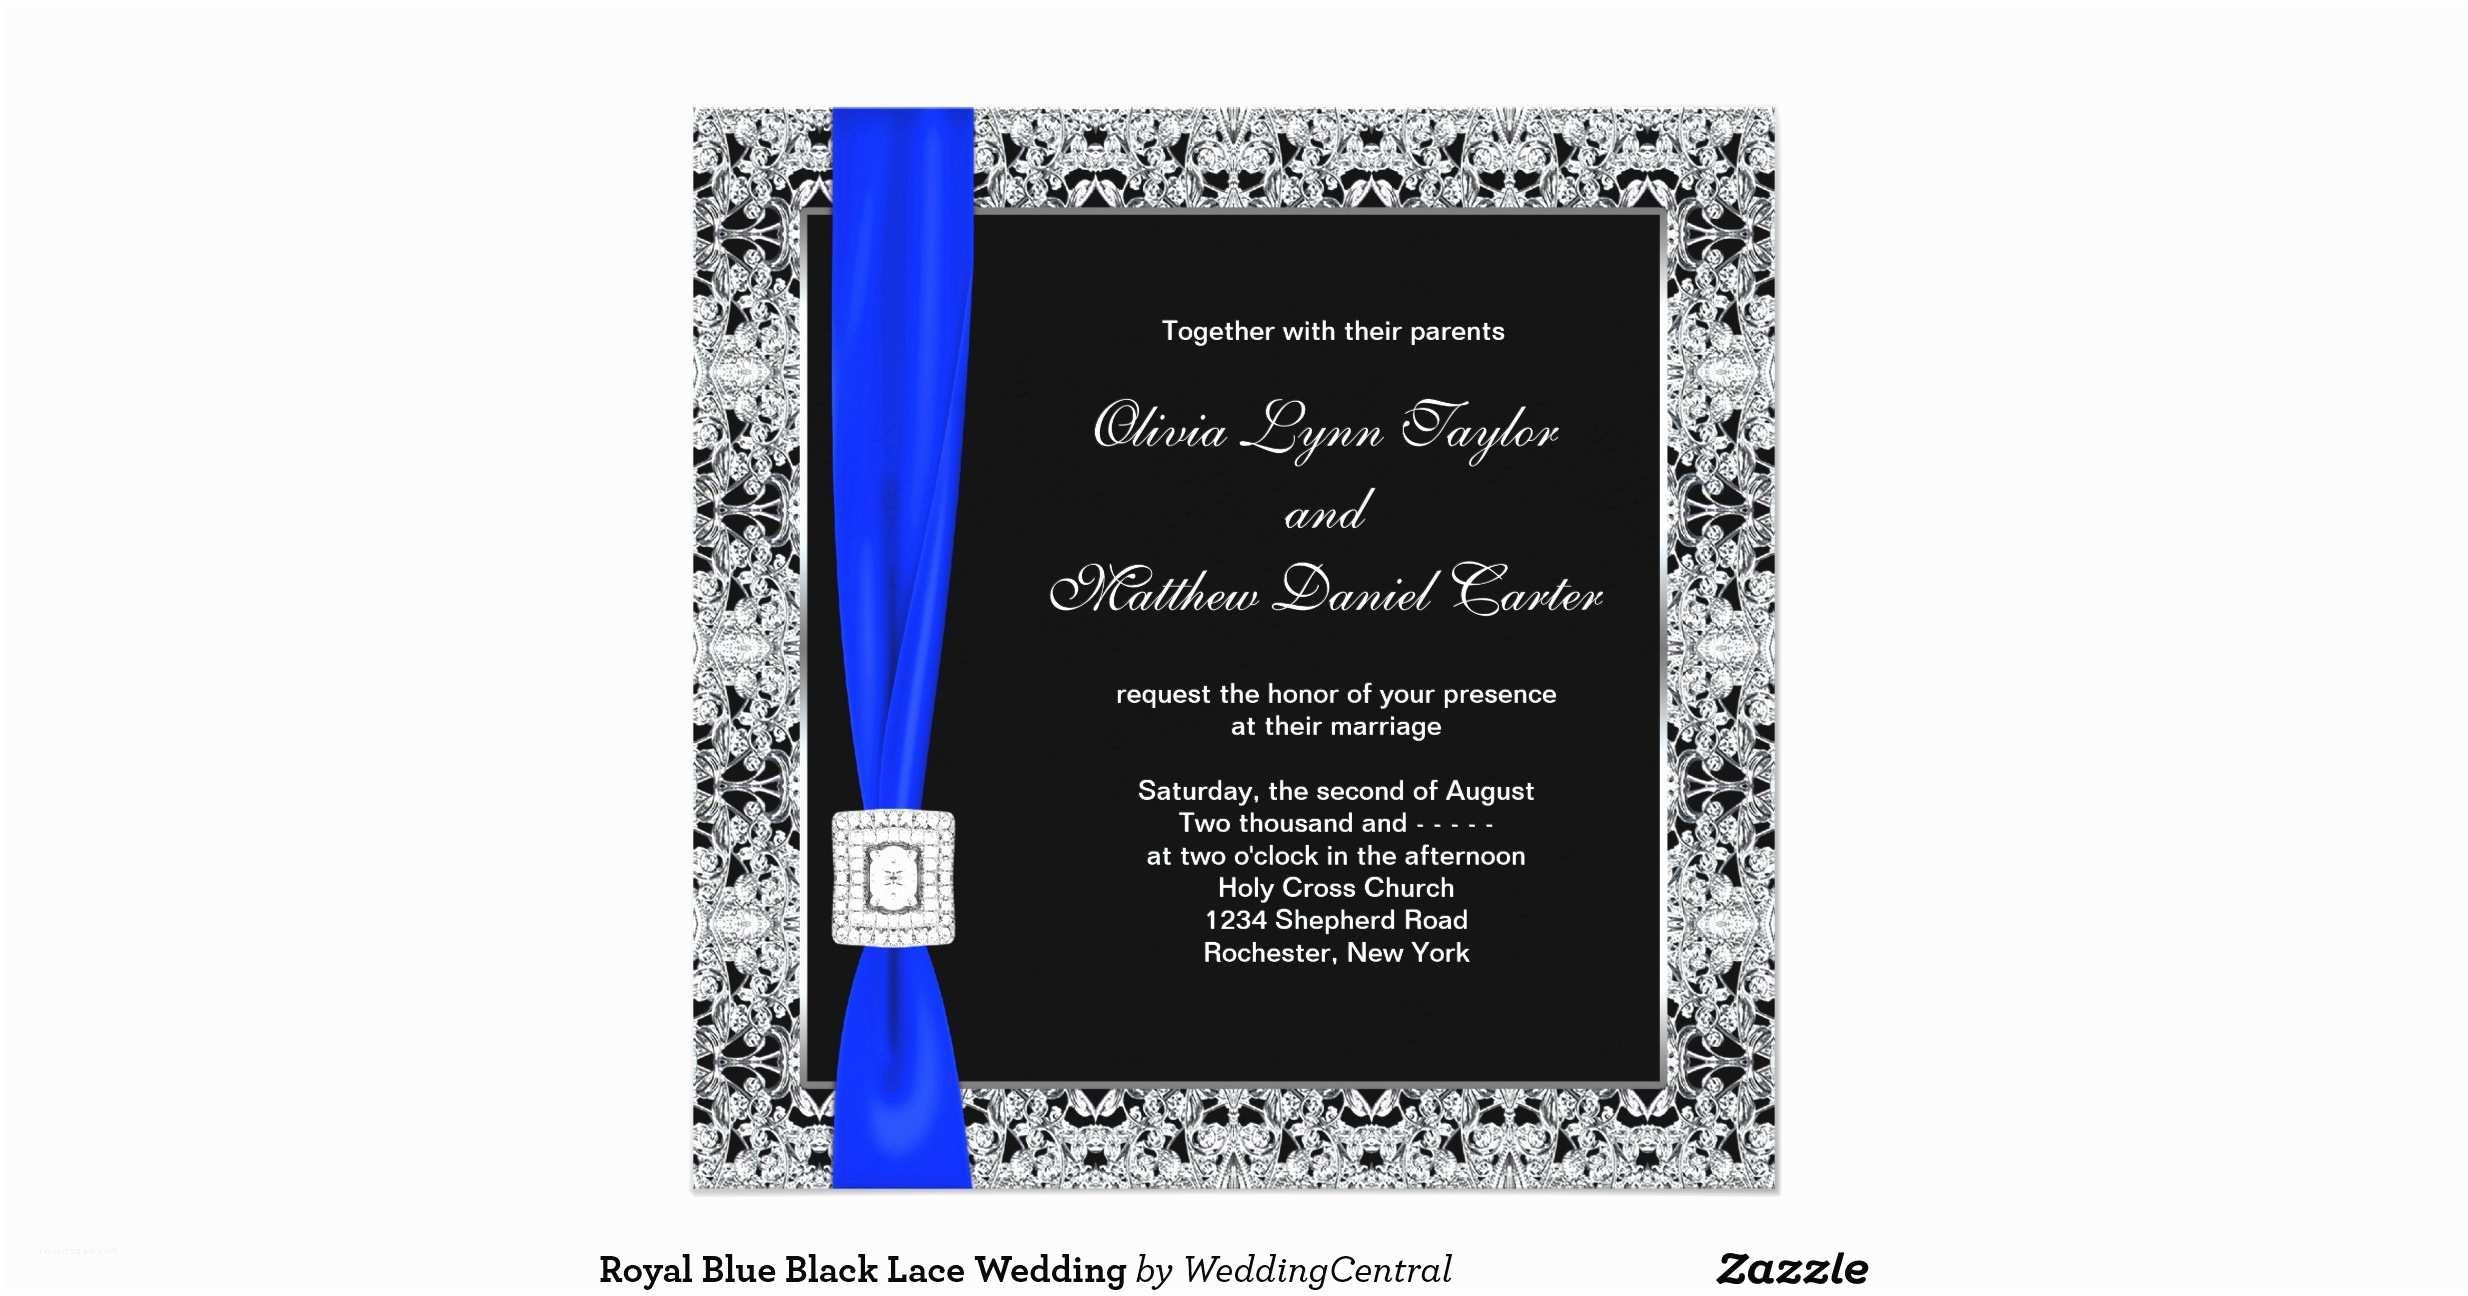 Royal Blue and Black Wedding Invitations Royal Blue Black Lace Wedding Invitation